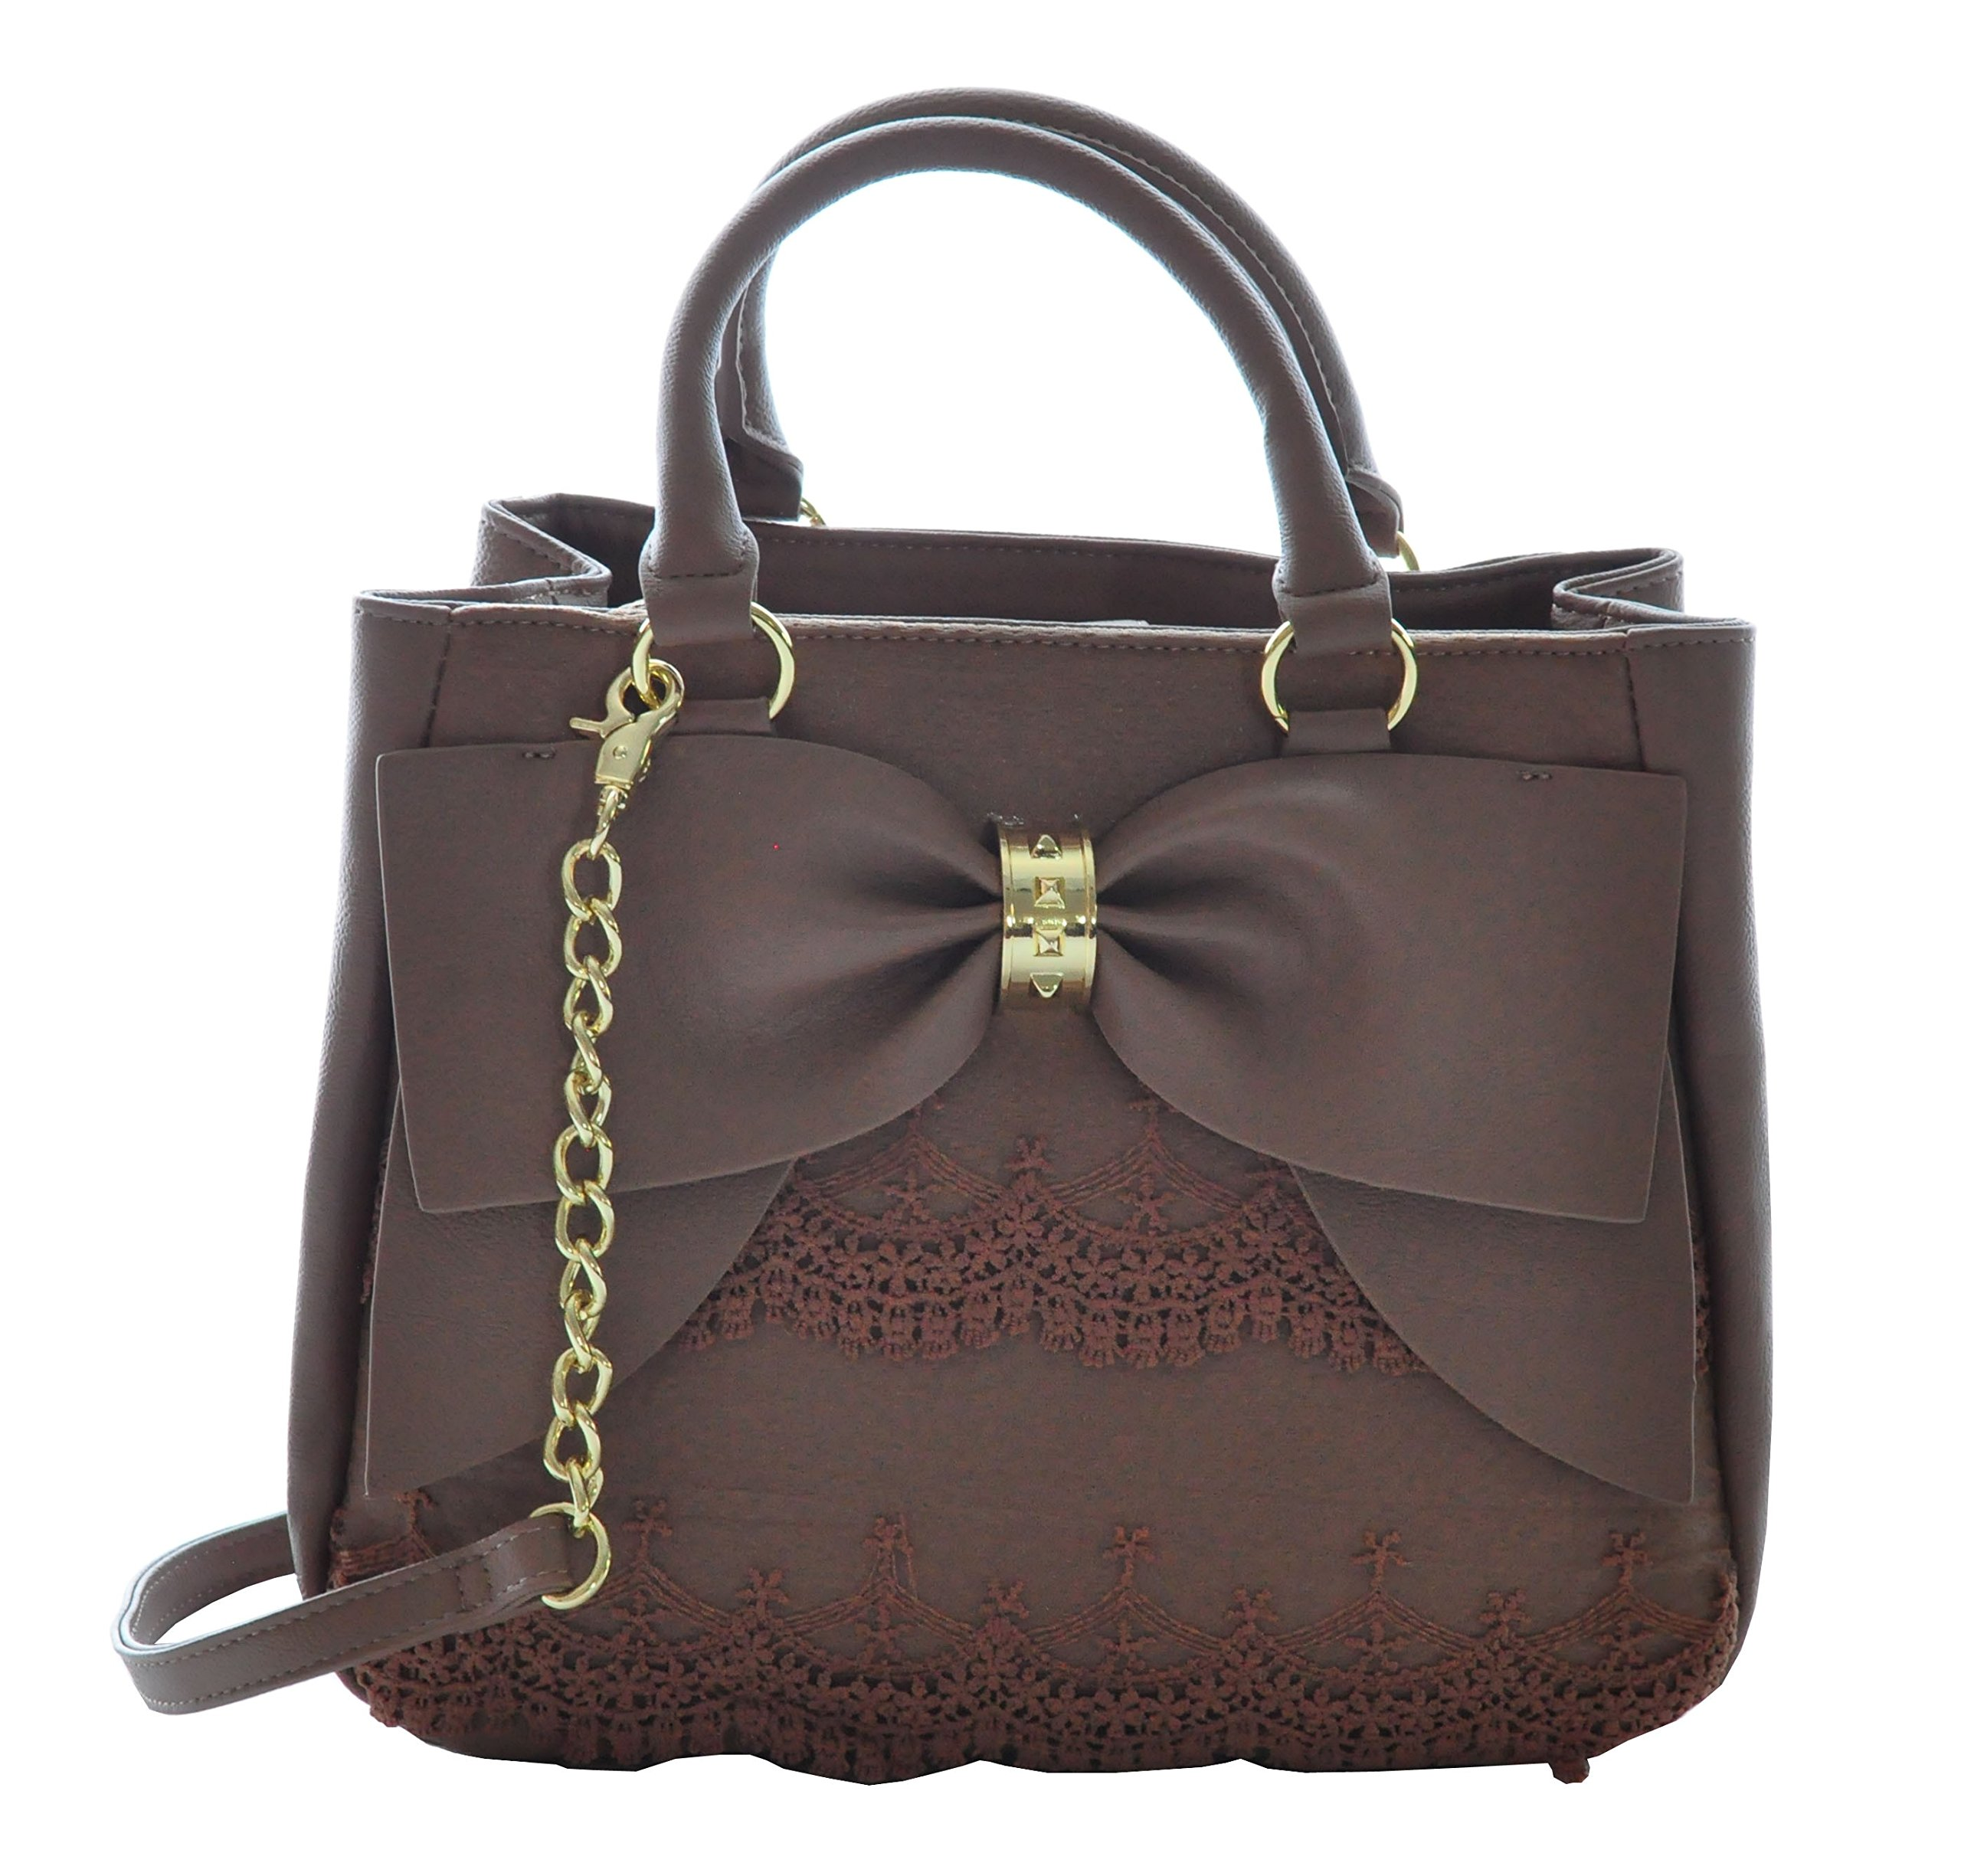 Betsey Johnson Bow on Bucket Satchel Bag, Spice